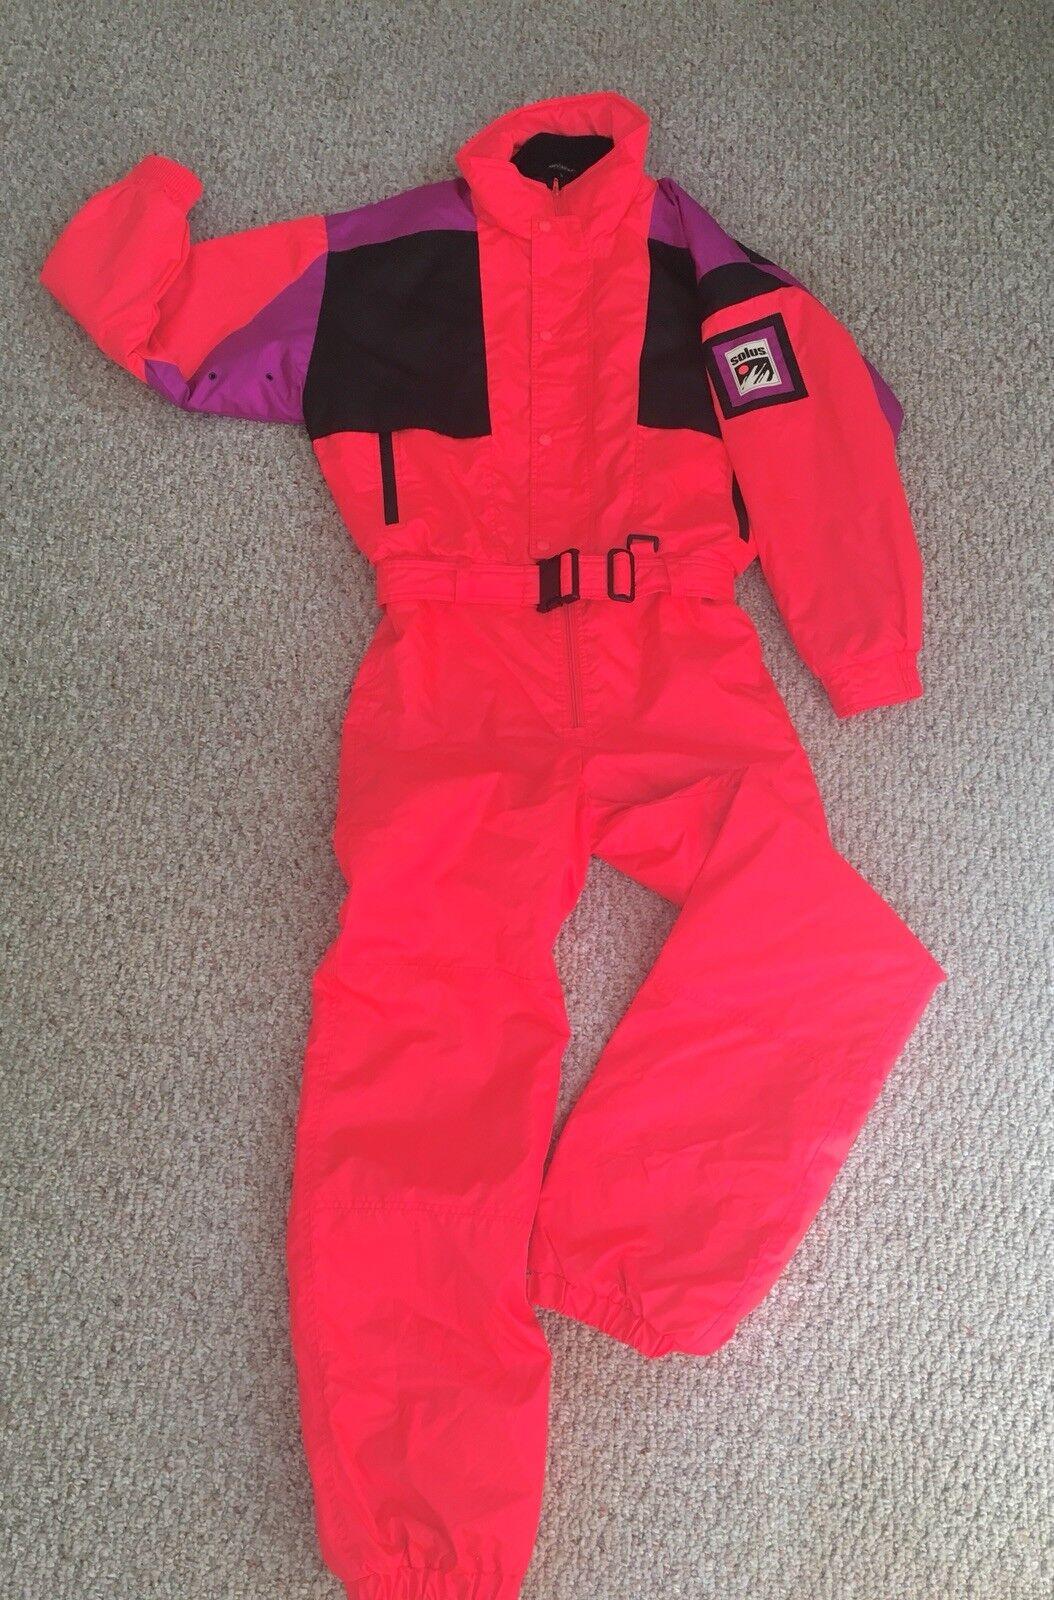 VTG SOLUS Snowsuit 1 Piece Neon orange Mens S Ski Snowboard Womens Unisex